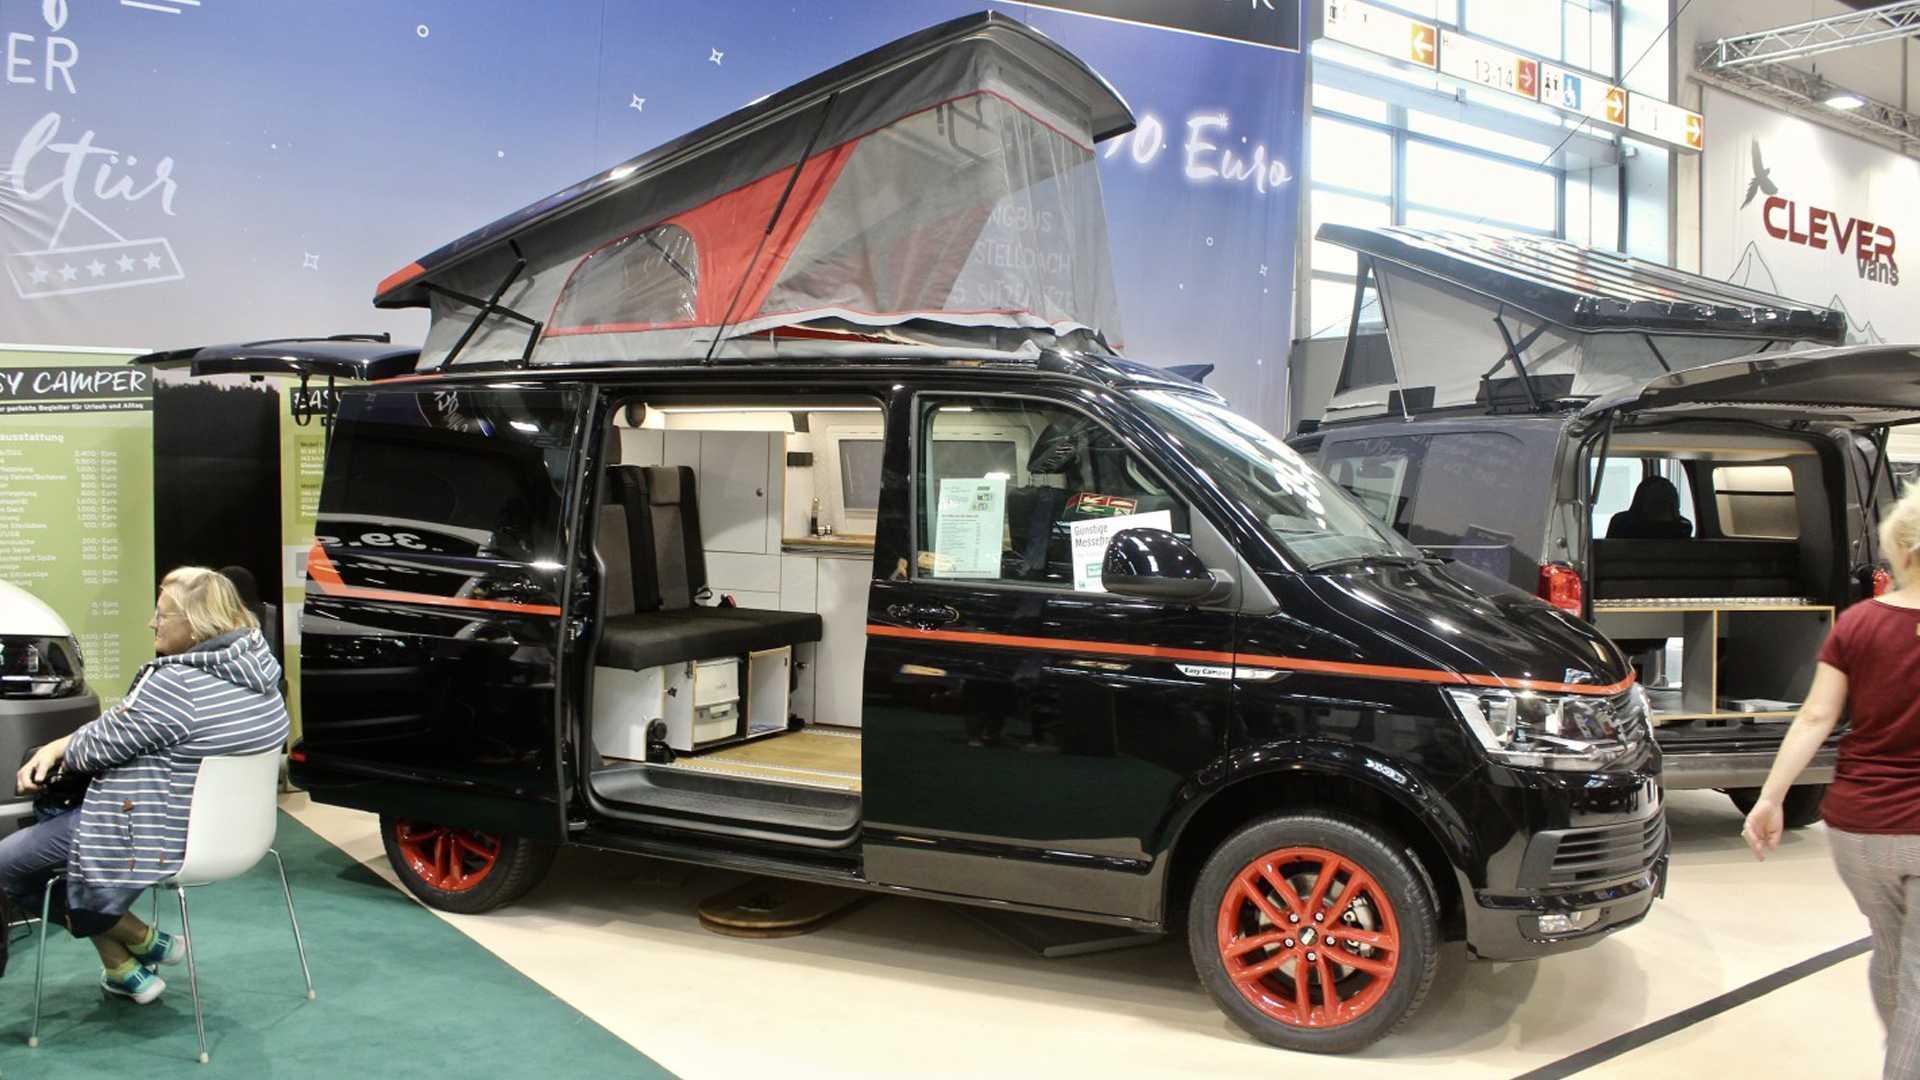 The Europeans Built An A-Team Camper Van We Desperately Want